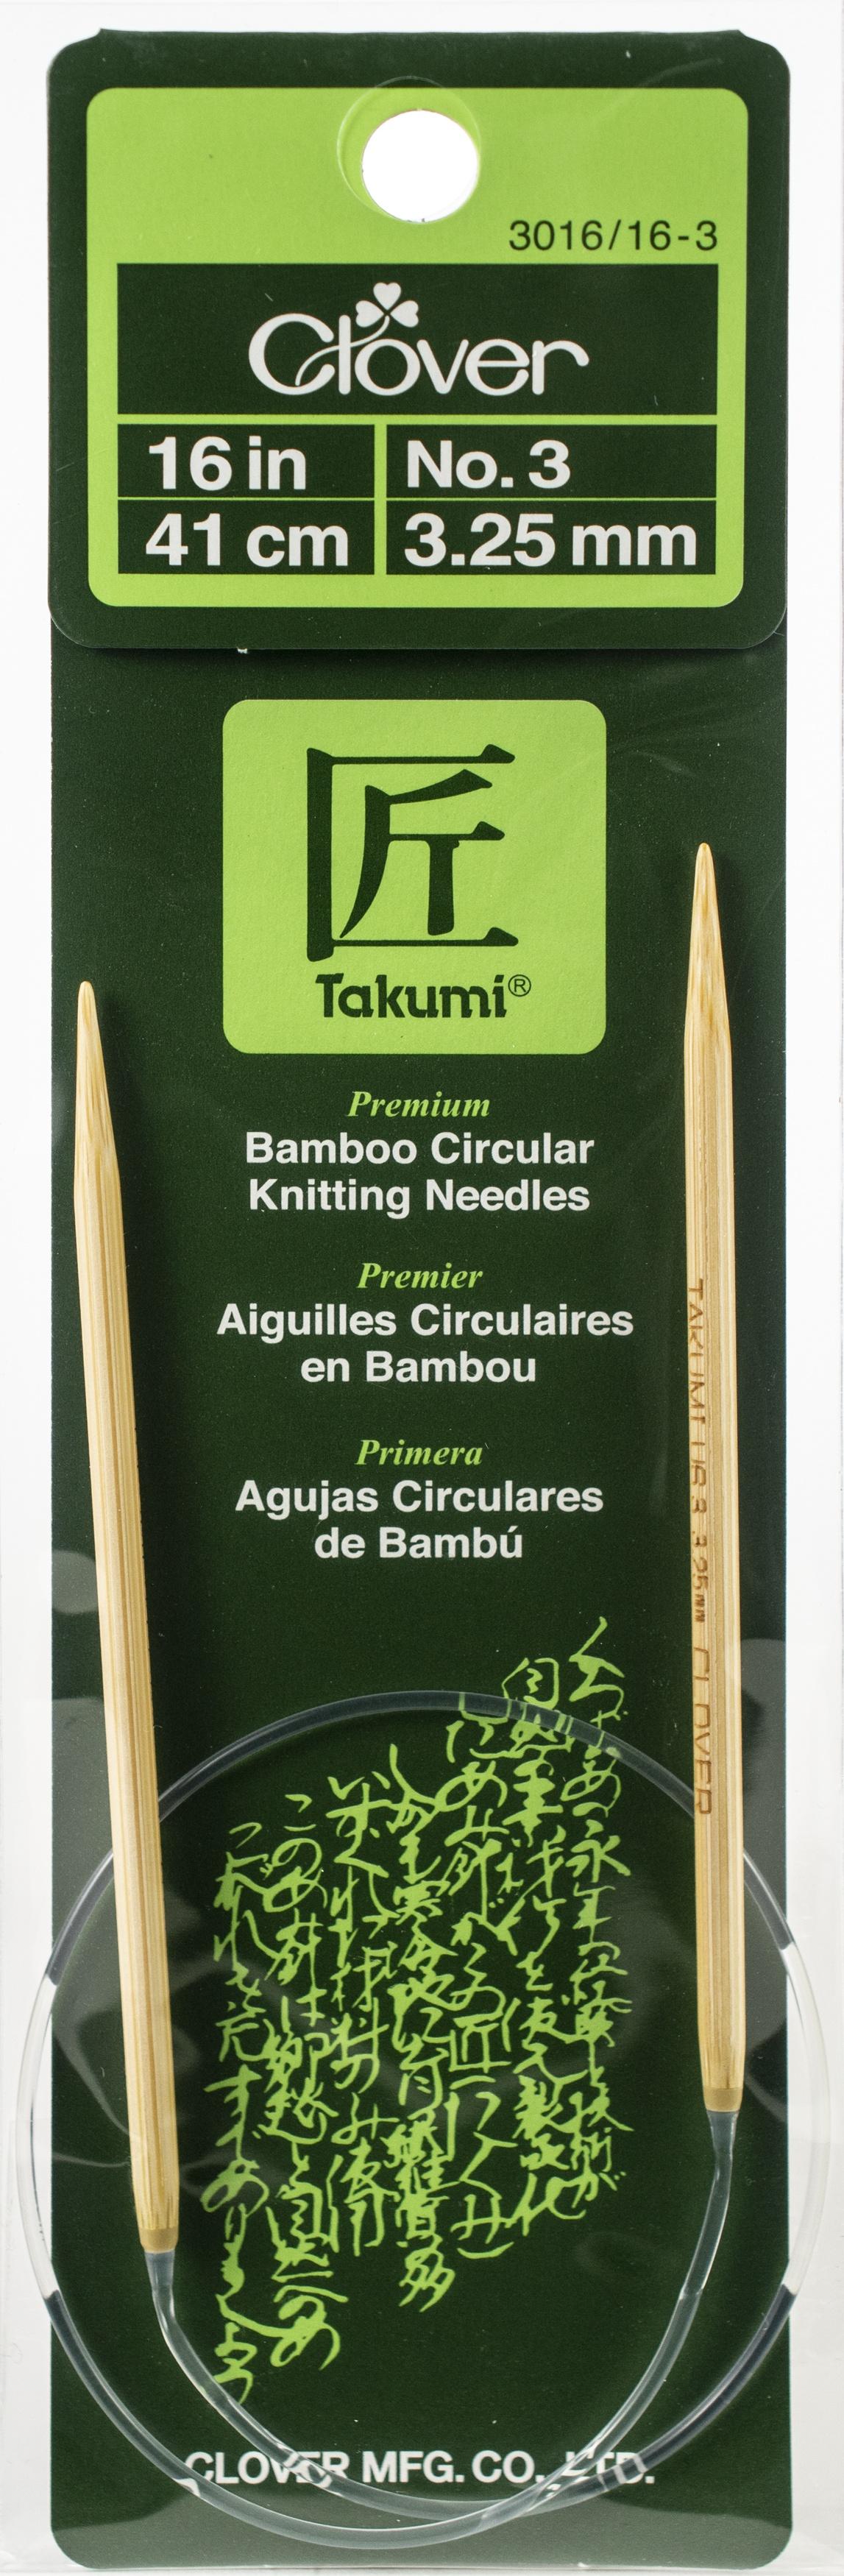 Takumi Bamboo Circular Knitting Needles 16-Size 3/3.25mm